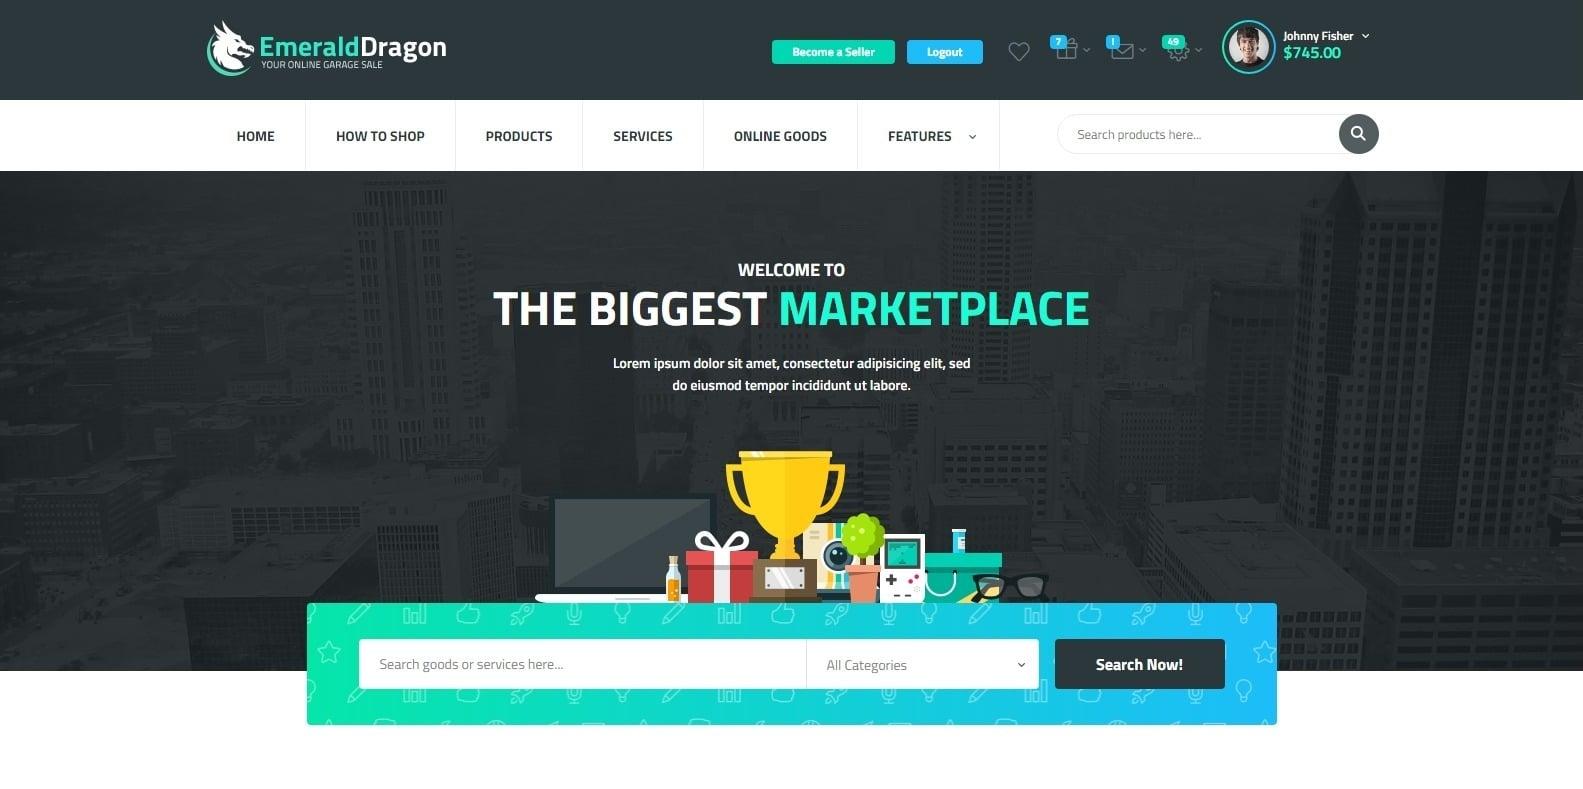 emeralddragon-auction-website-templates-wordpress